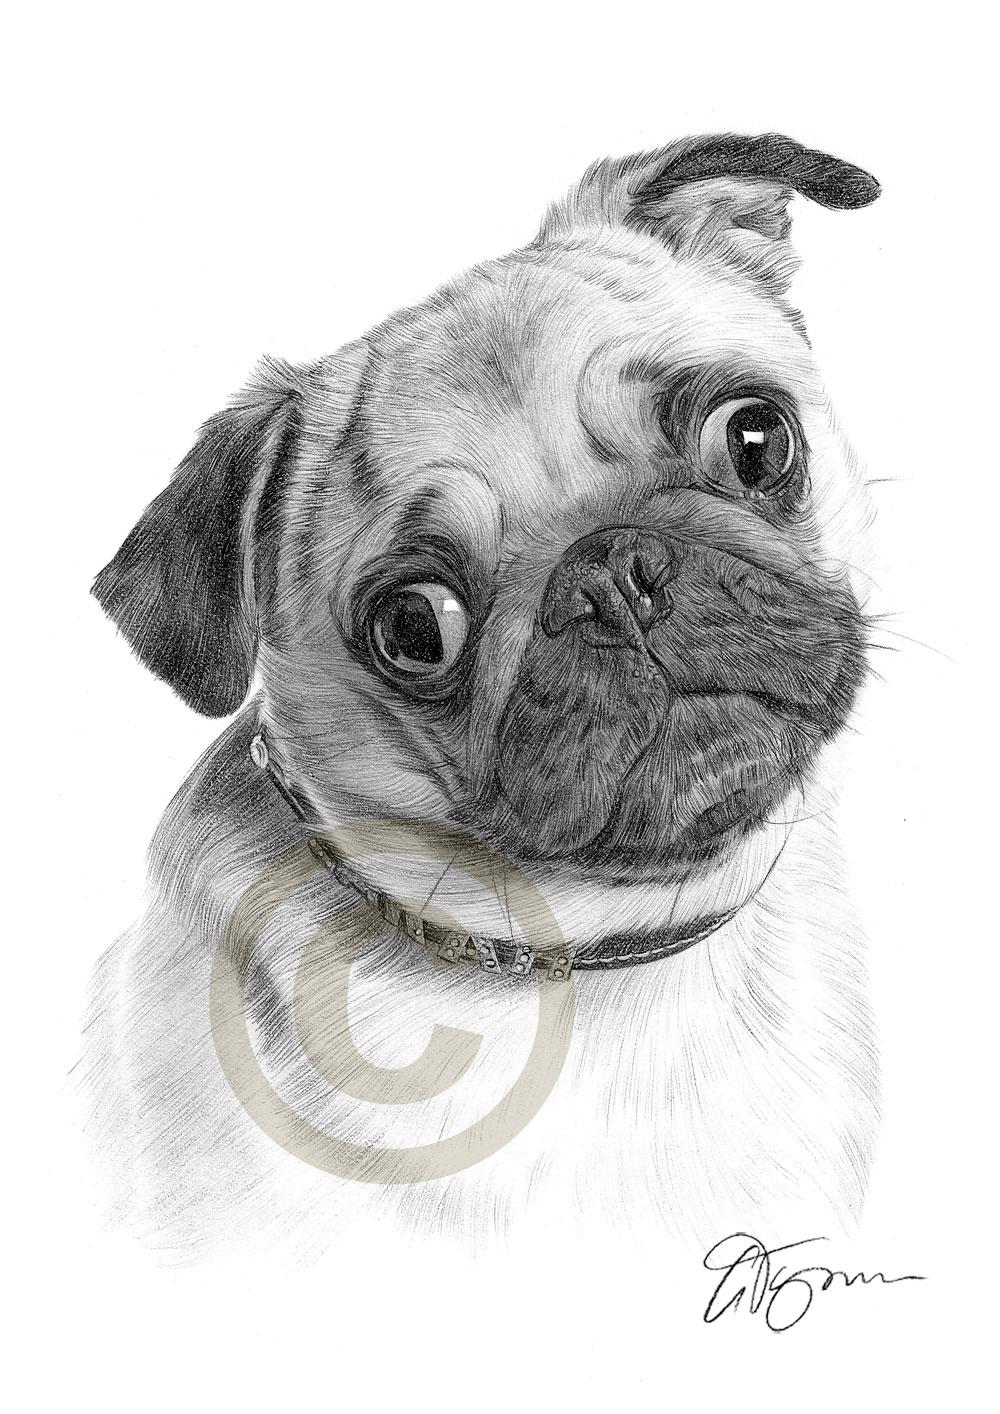 Drawn pug pug dog Thumbnail pencil Worldwide signed prints